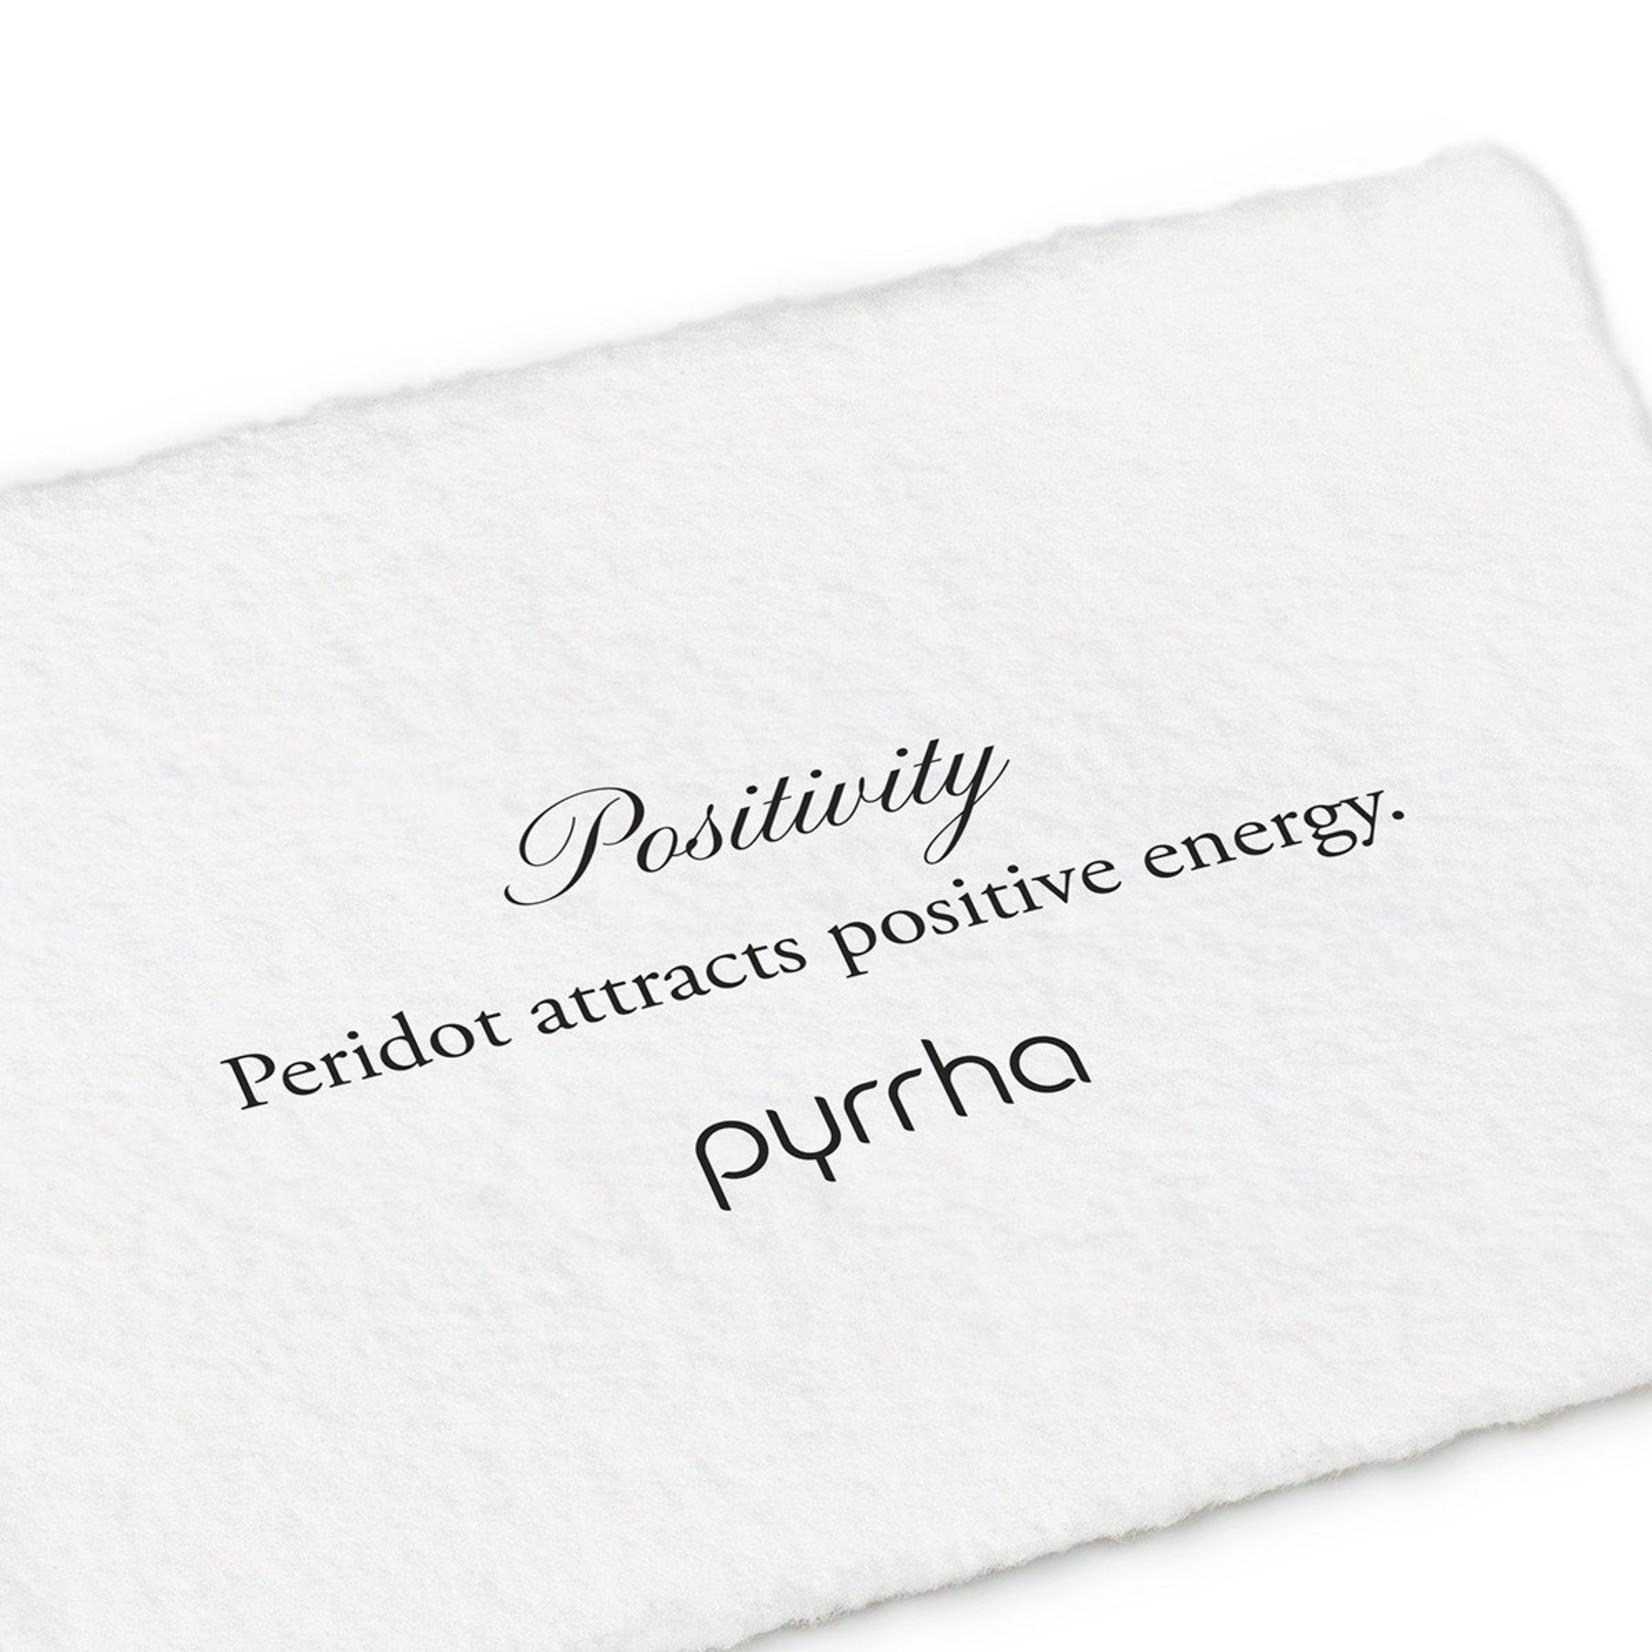 Pyrrha Positivity Signature Attraction Charm